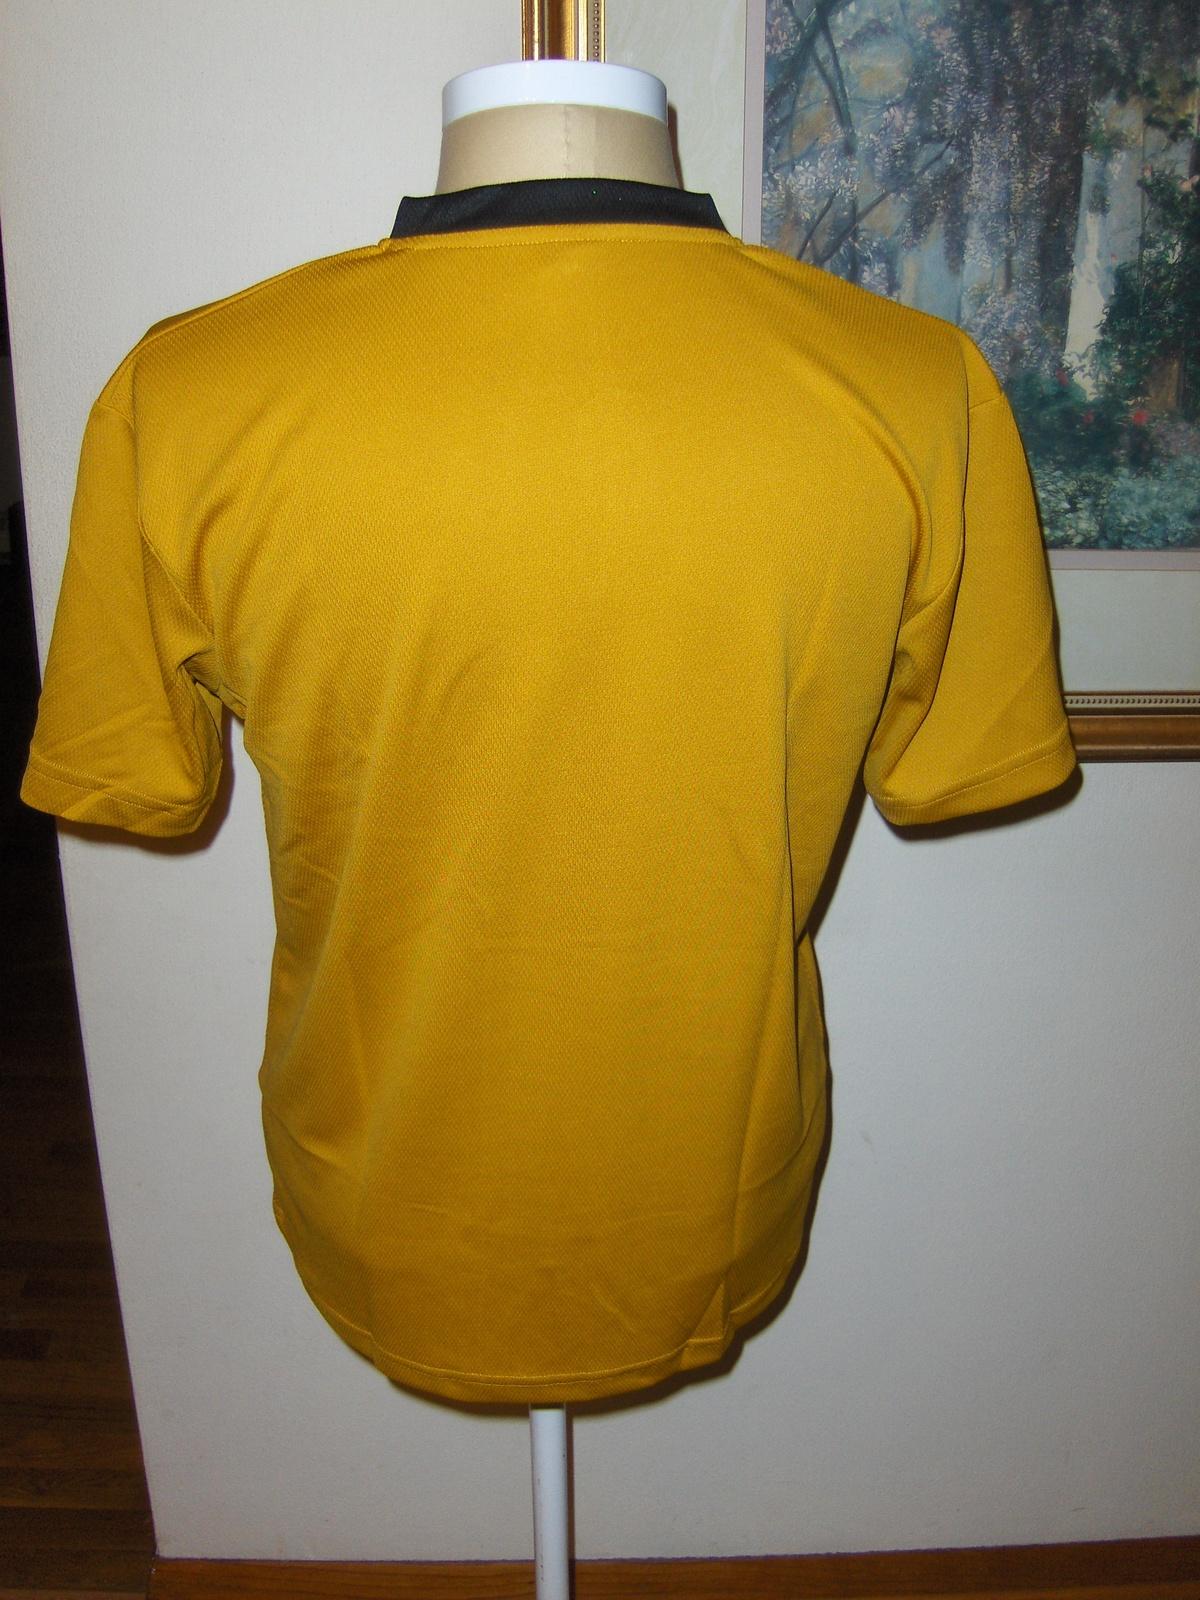 Kellogg's Star Trek Yellow T-Shirt Unisex Size Medium  2009